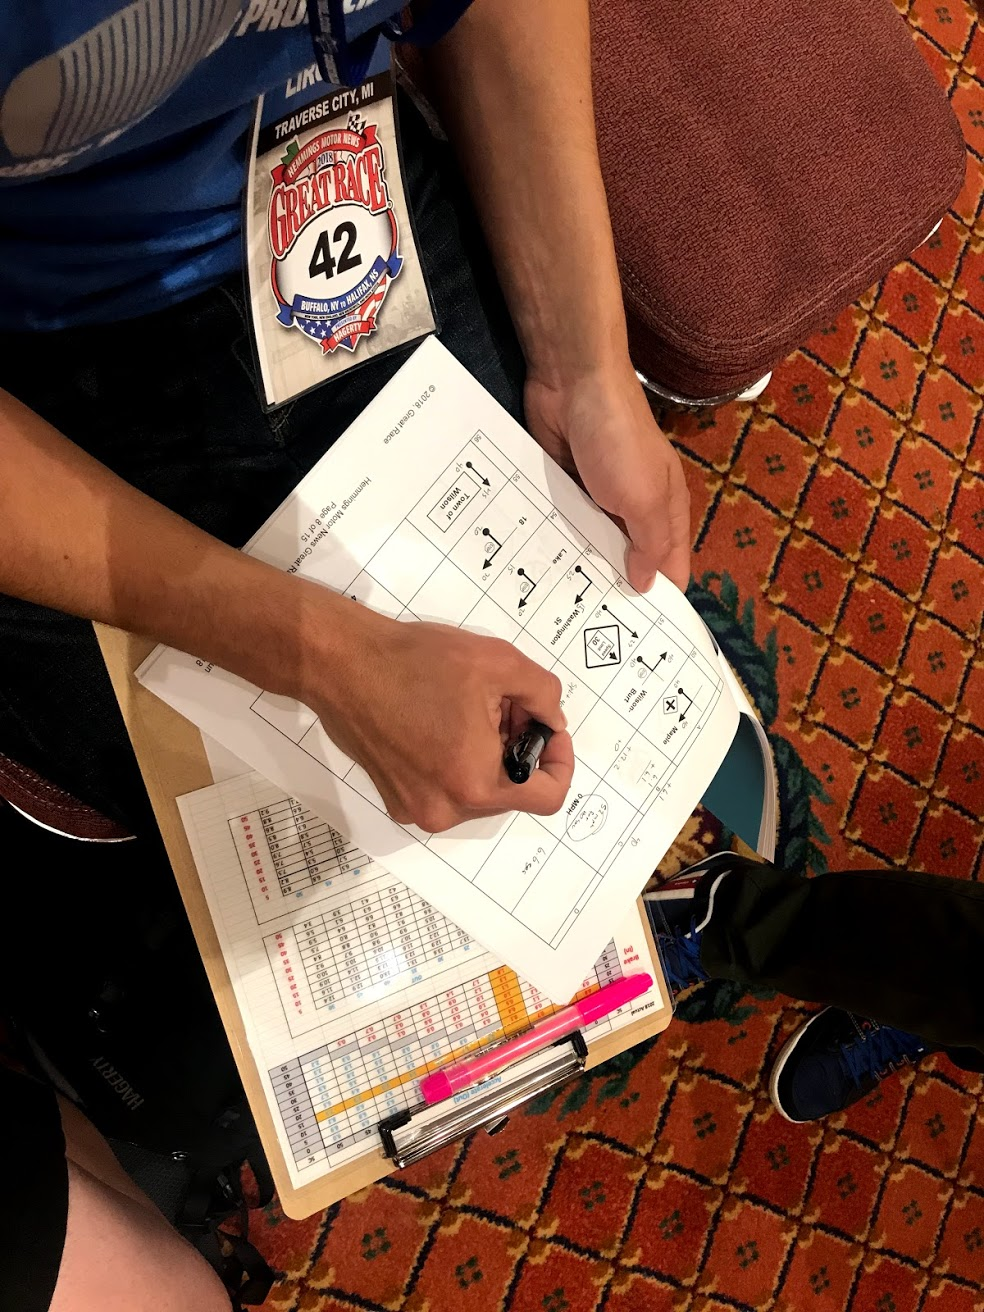 Brett marking directions prior to Trophy Run